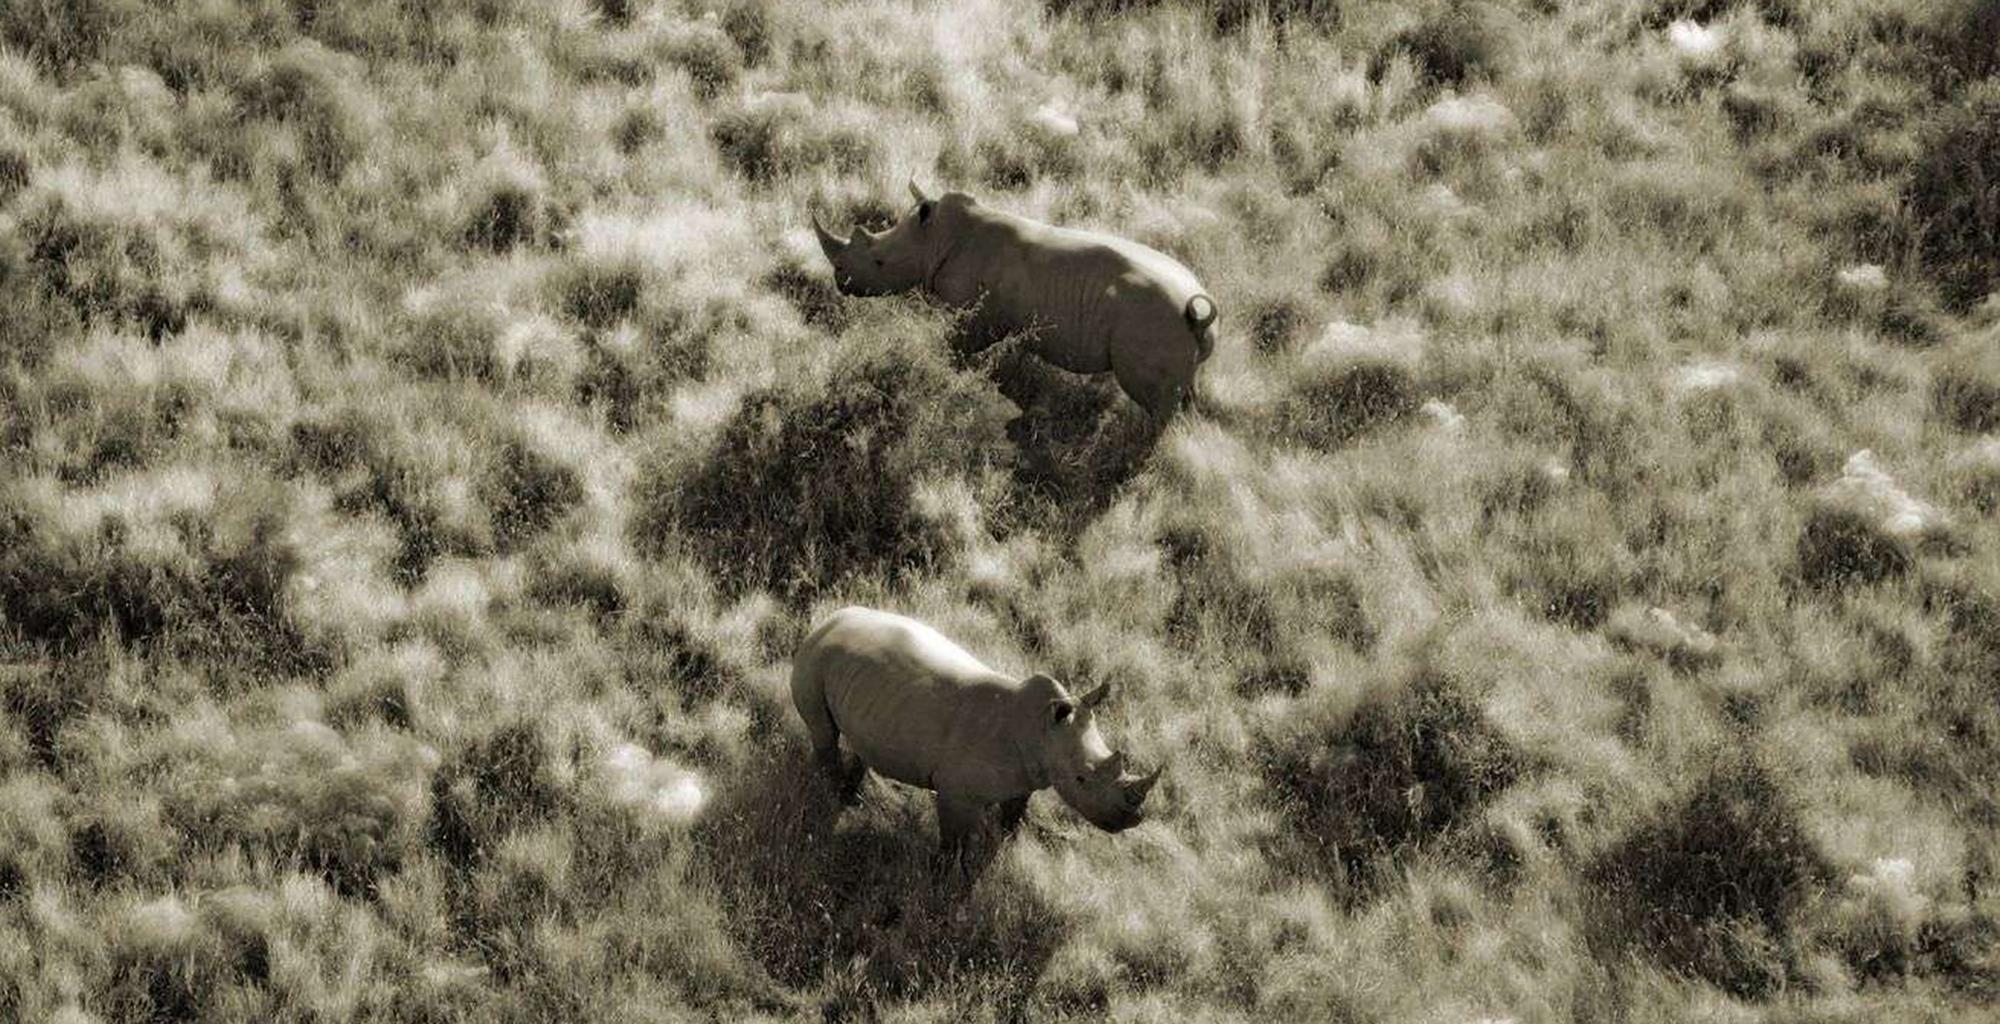 Kenya-Enasoit-Rhino-Aerial